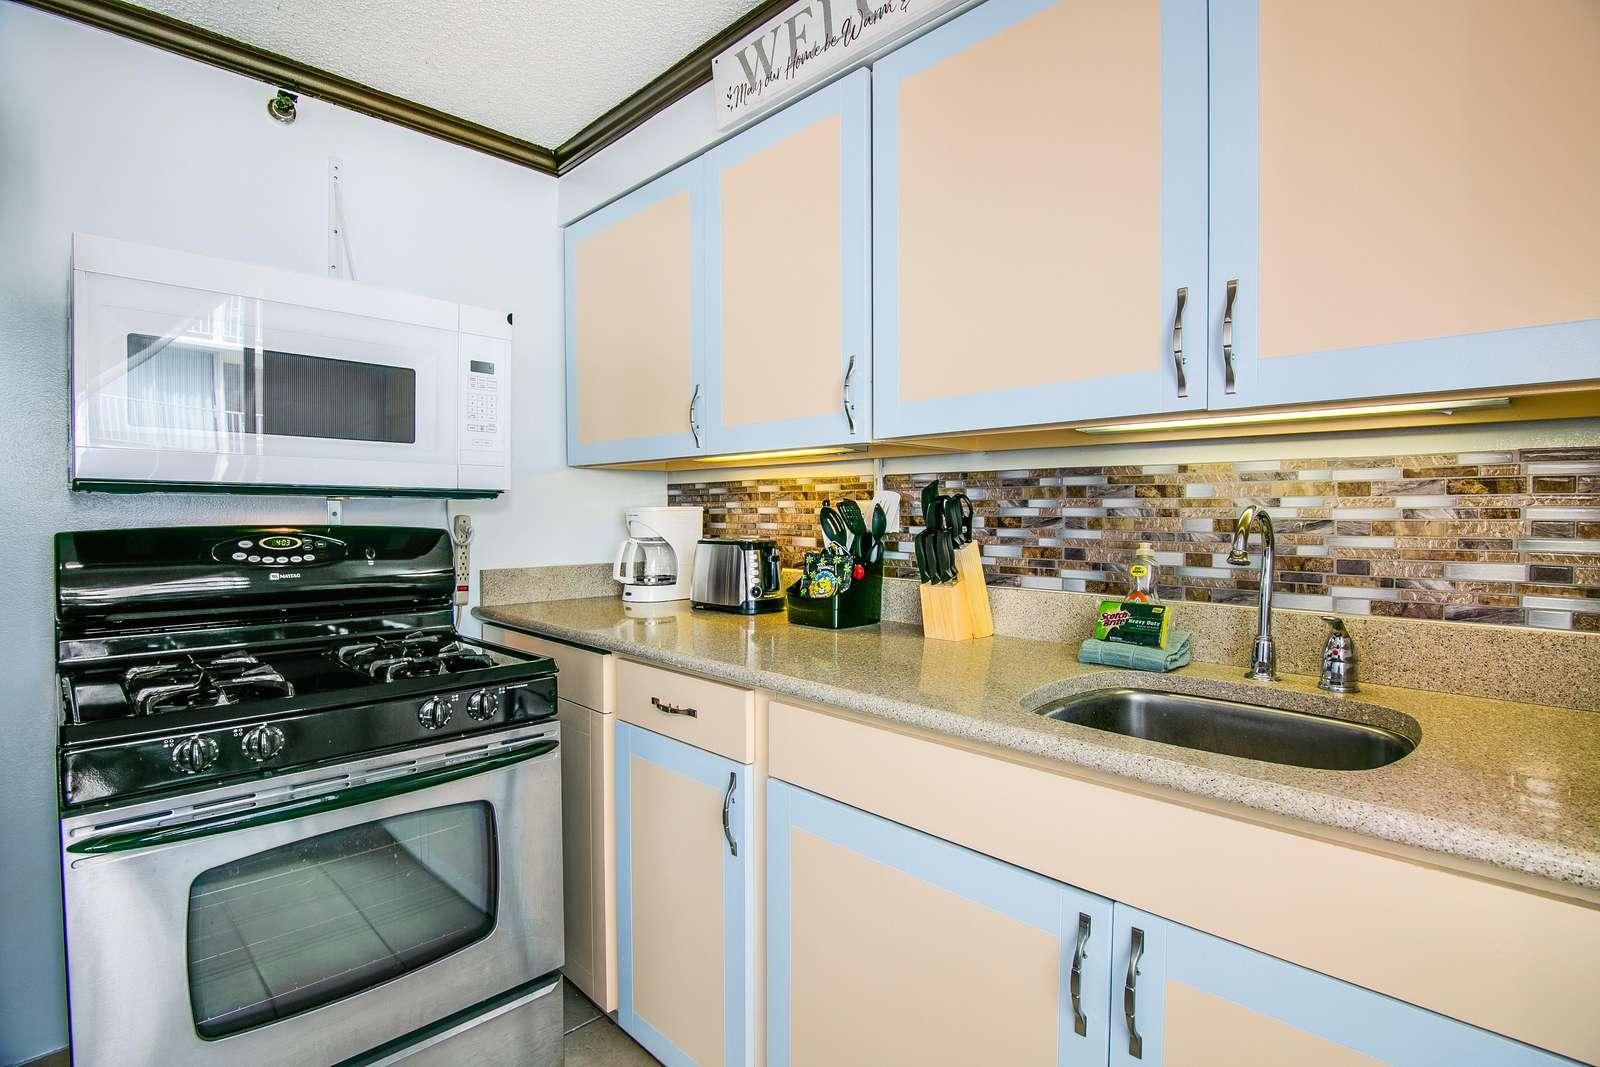 gas stove and modern microwave